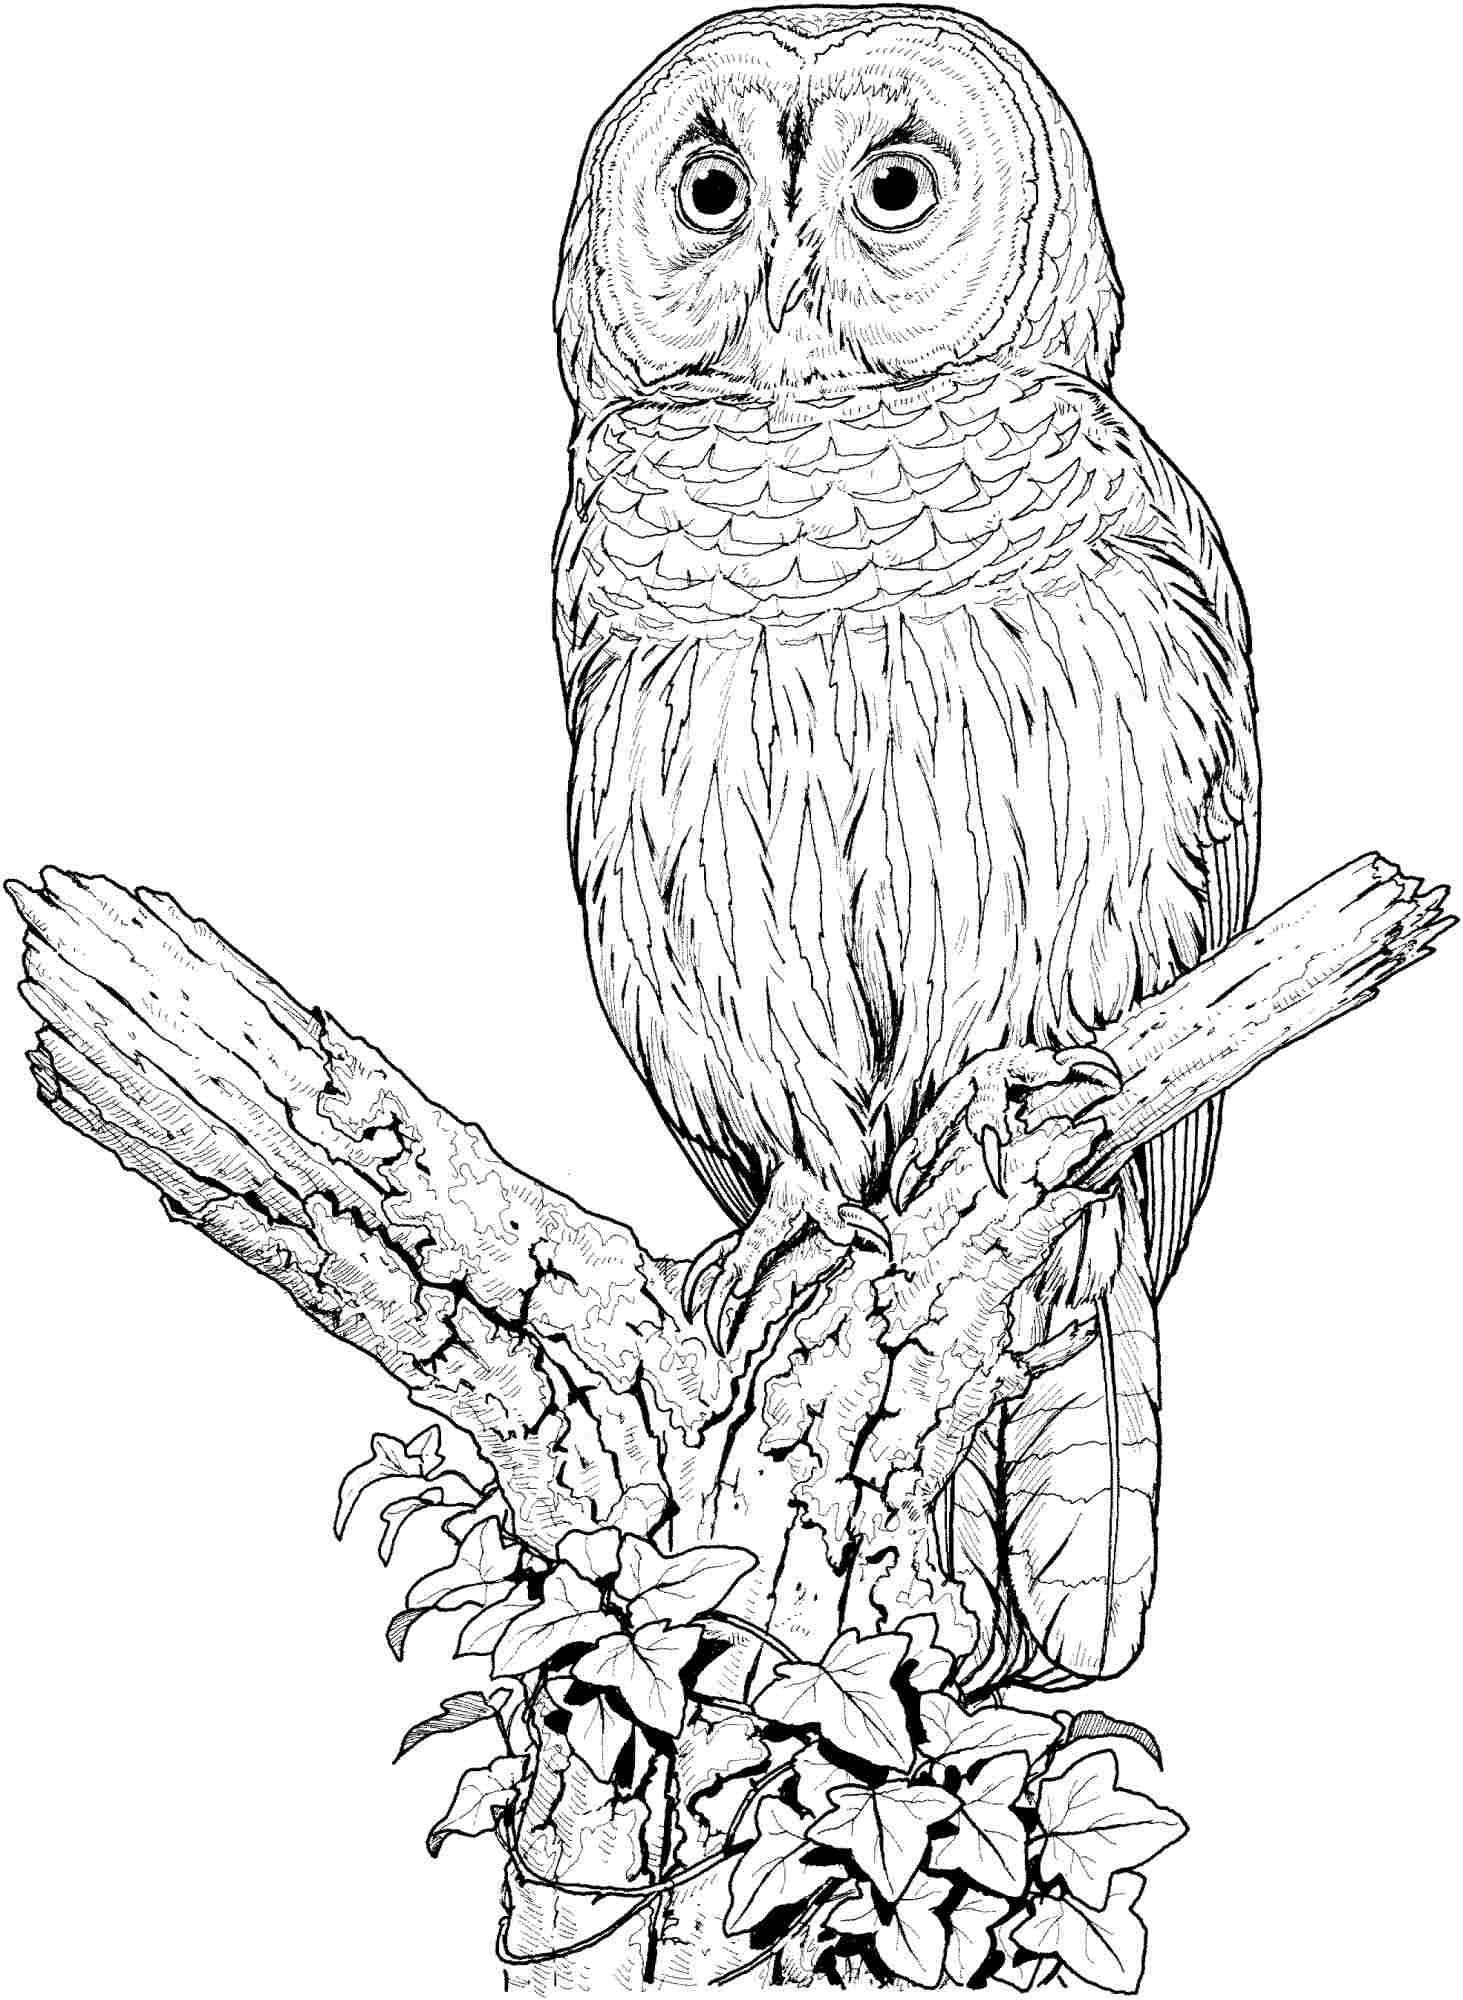 Colouring Sheets Animal Owl Free Printable For Preschool